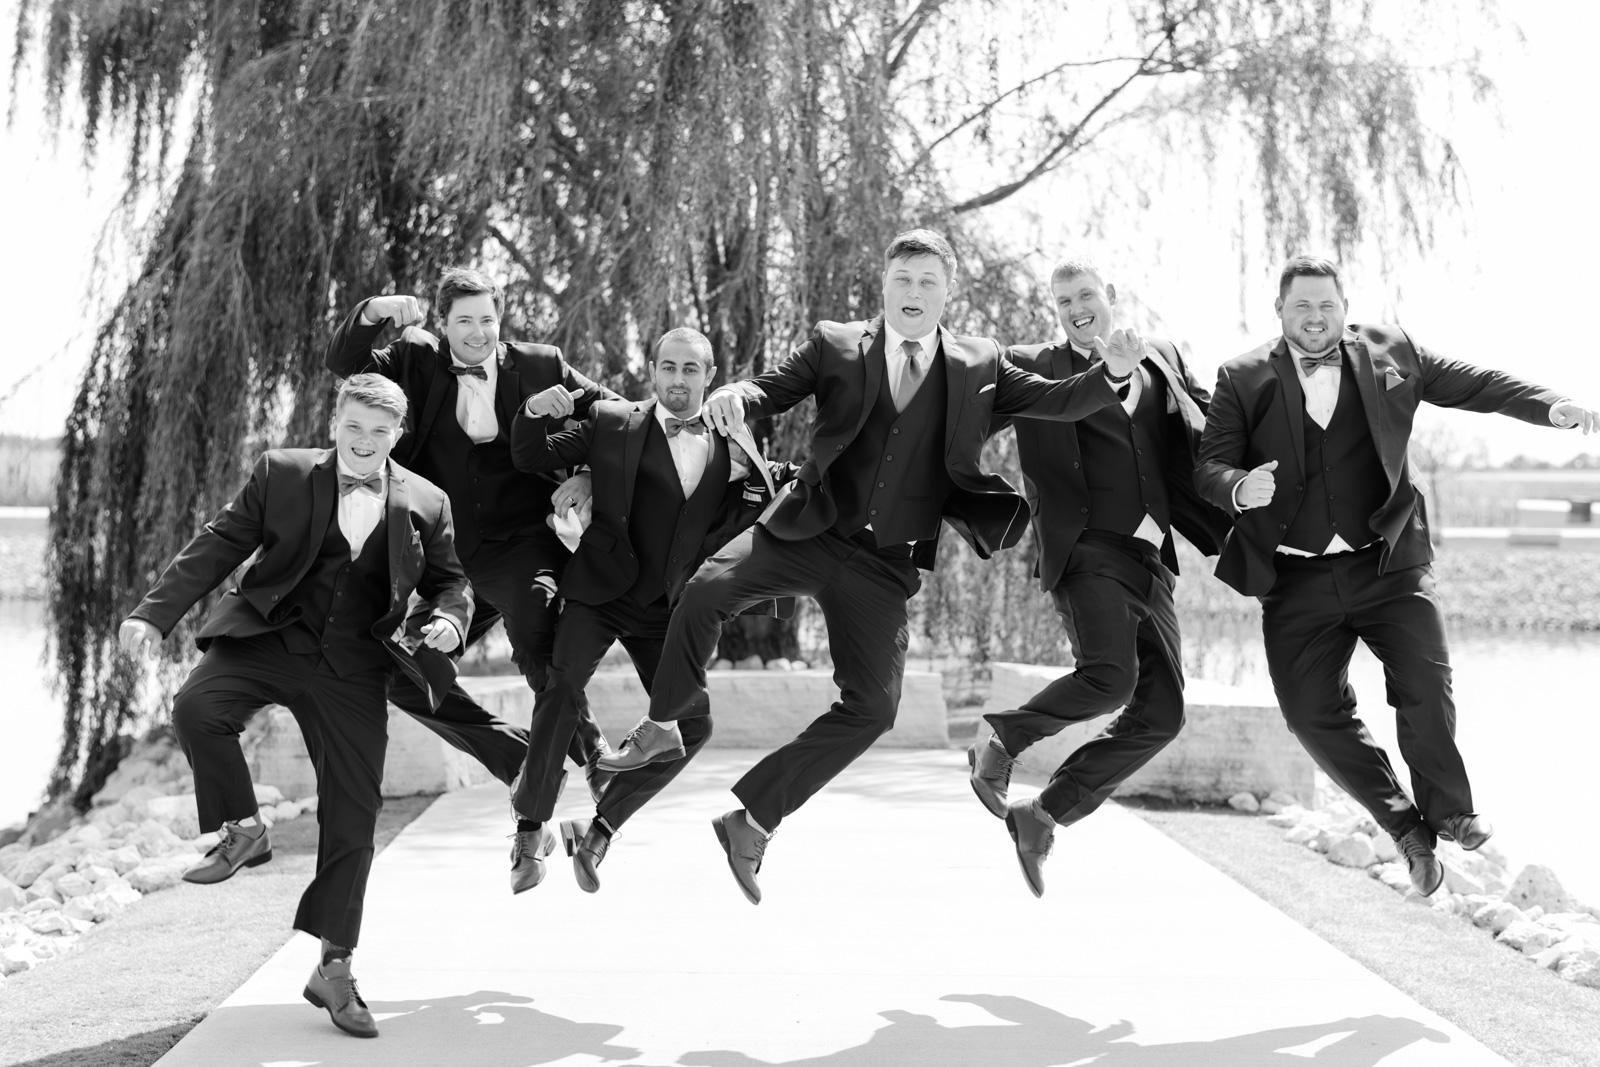 groomsmen in navy suits epic event center wedding venue